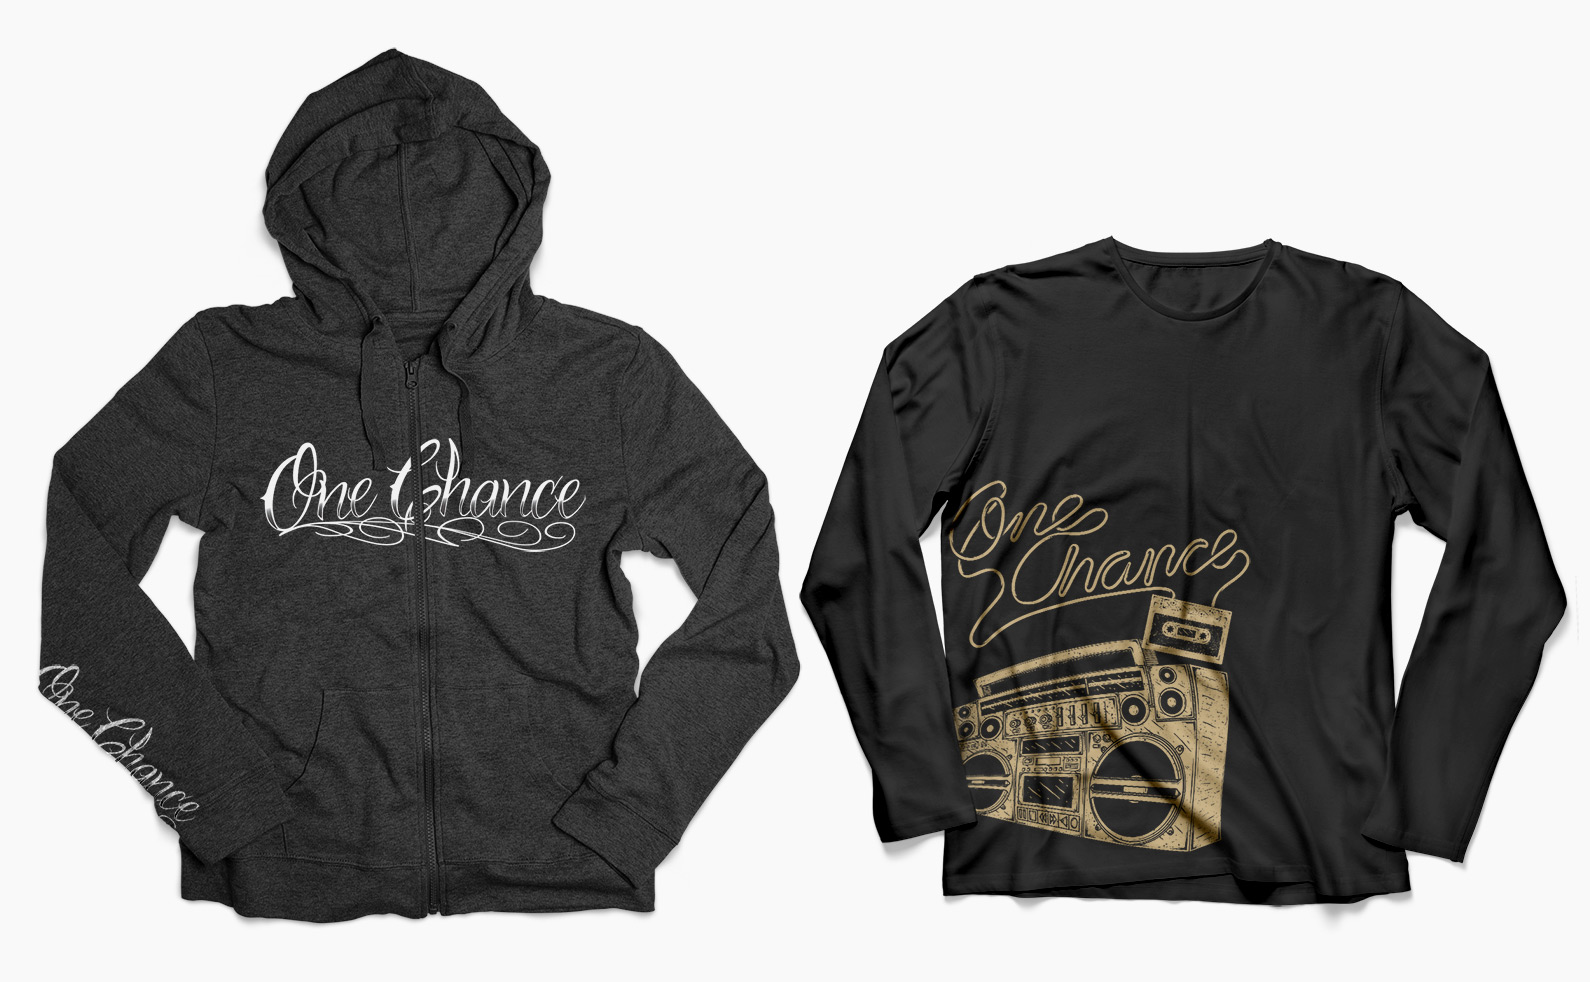 One Chance Product Development - Shirt & Hoodie